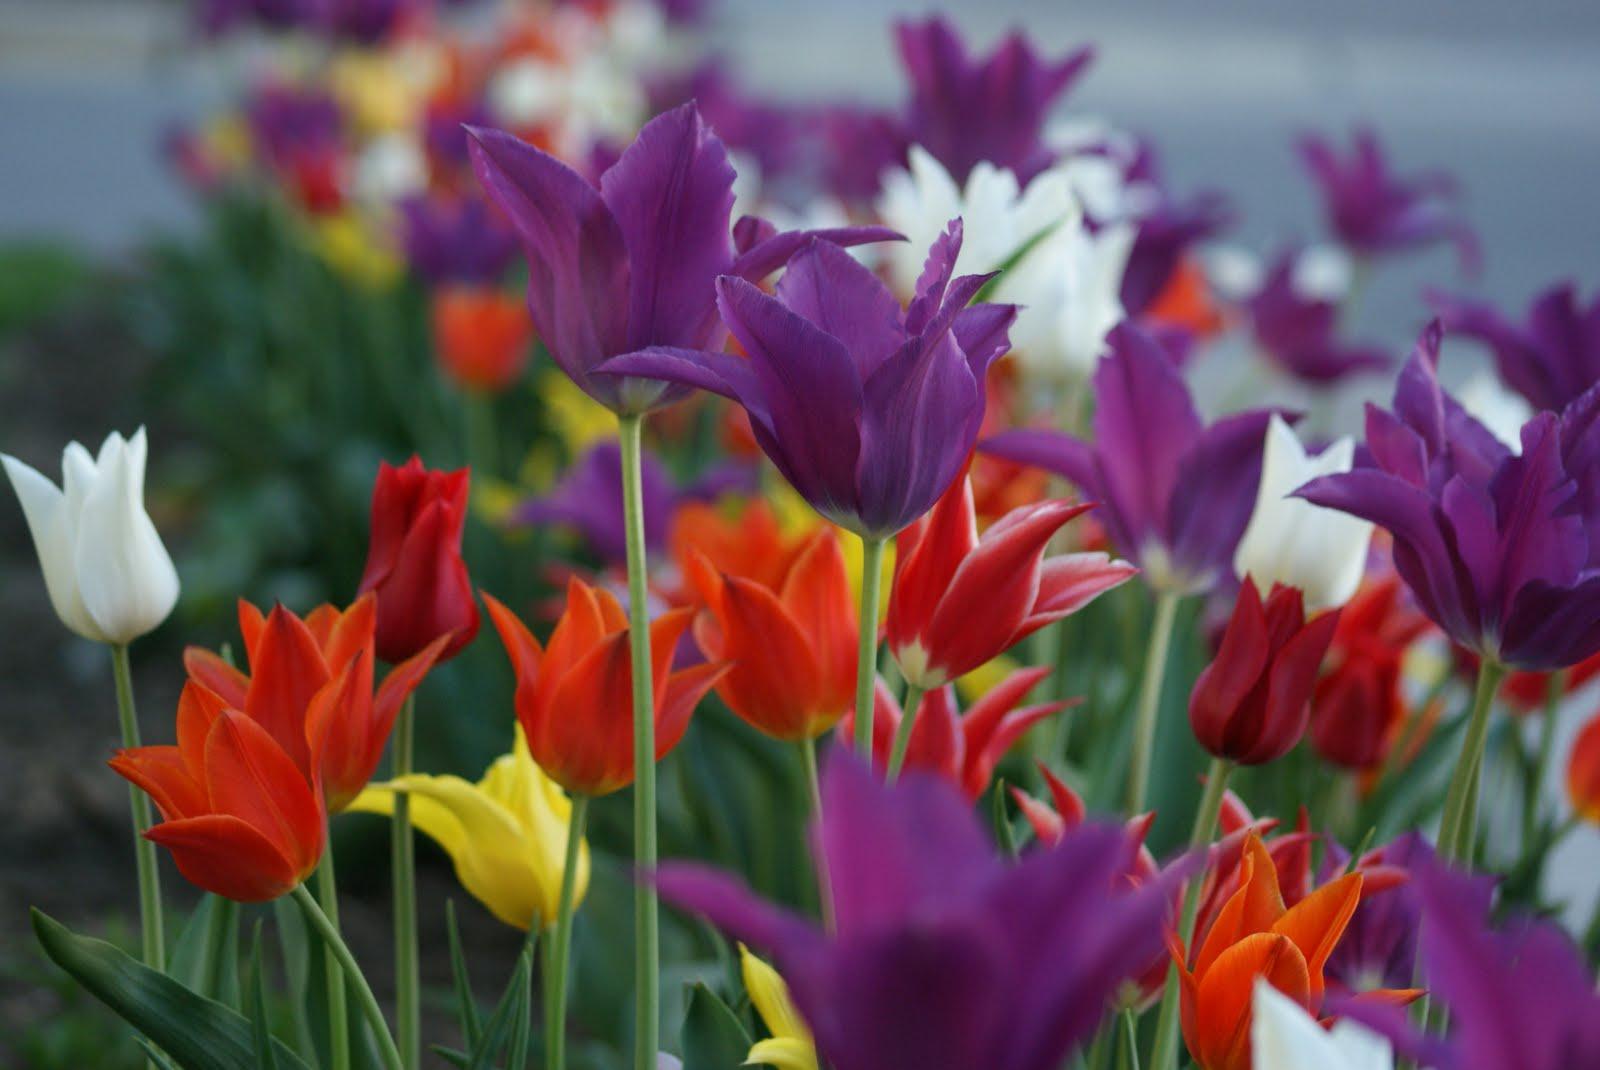 Peace Hd Wallpapers Free Download Vivid Flowers Wallpaper Hd Desktop Wallpapers 4k Hd